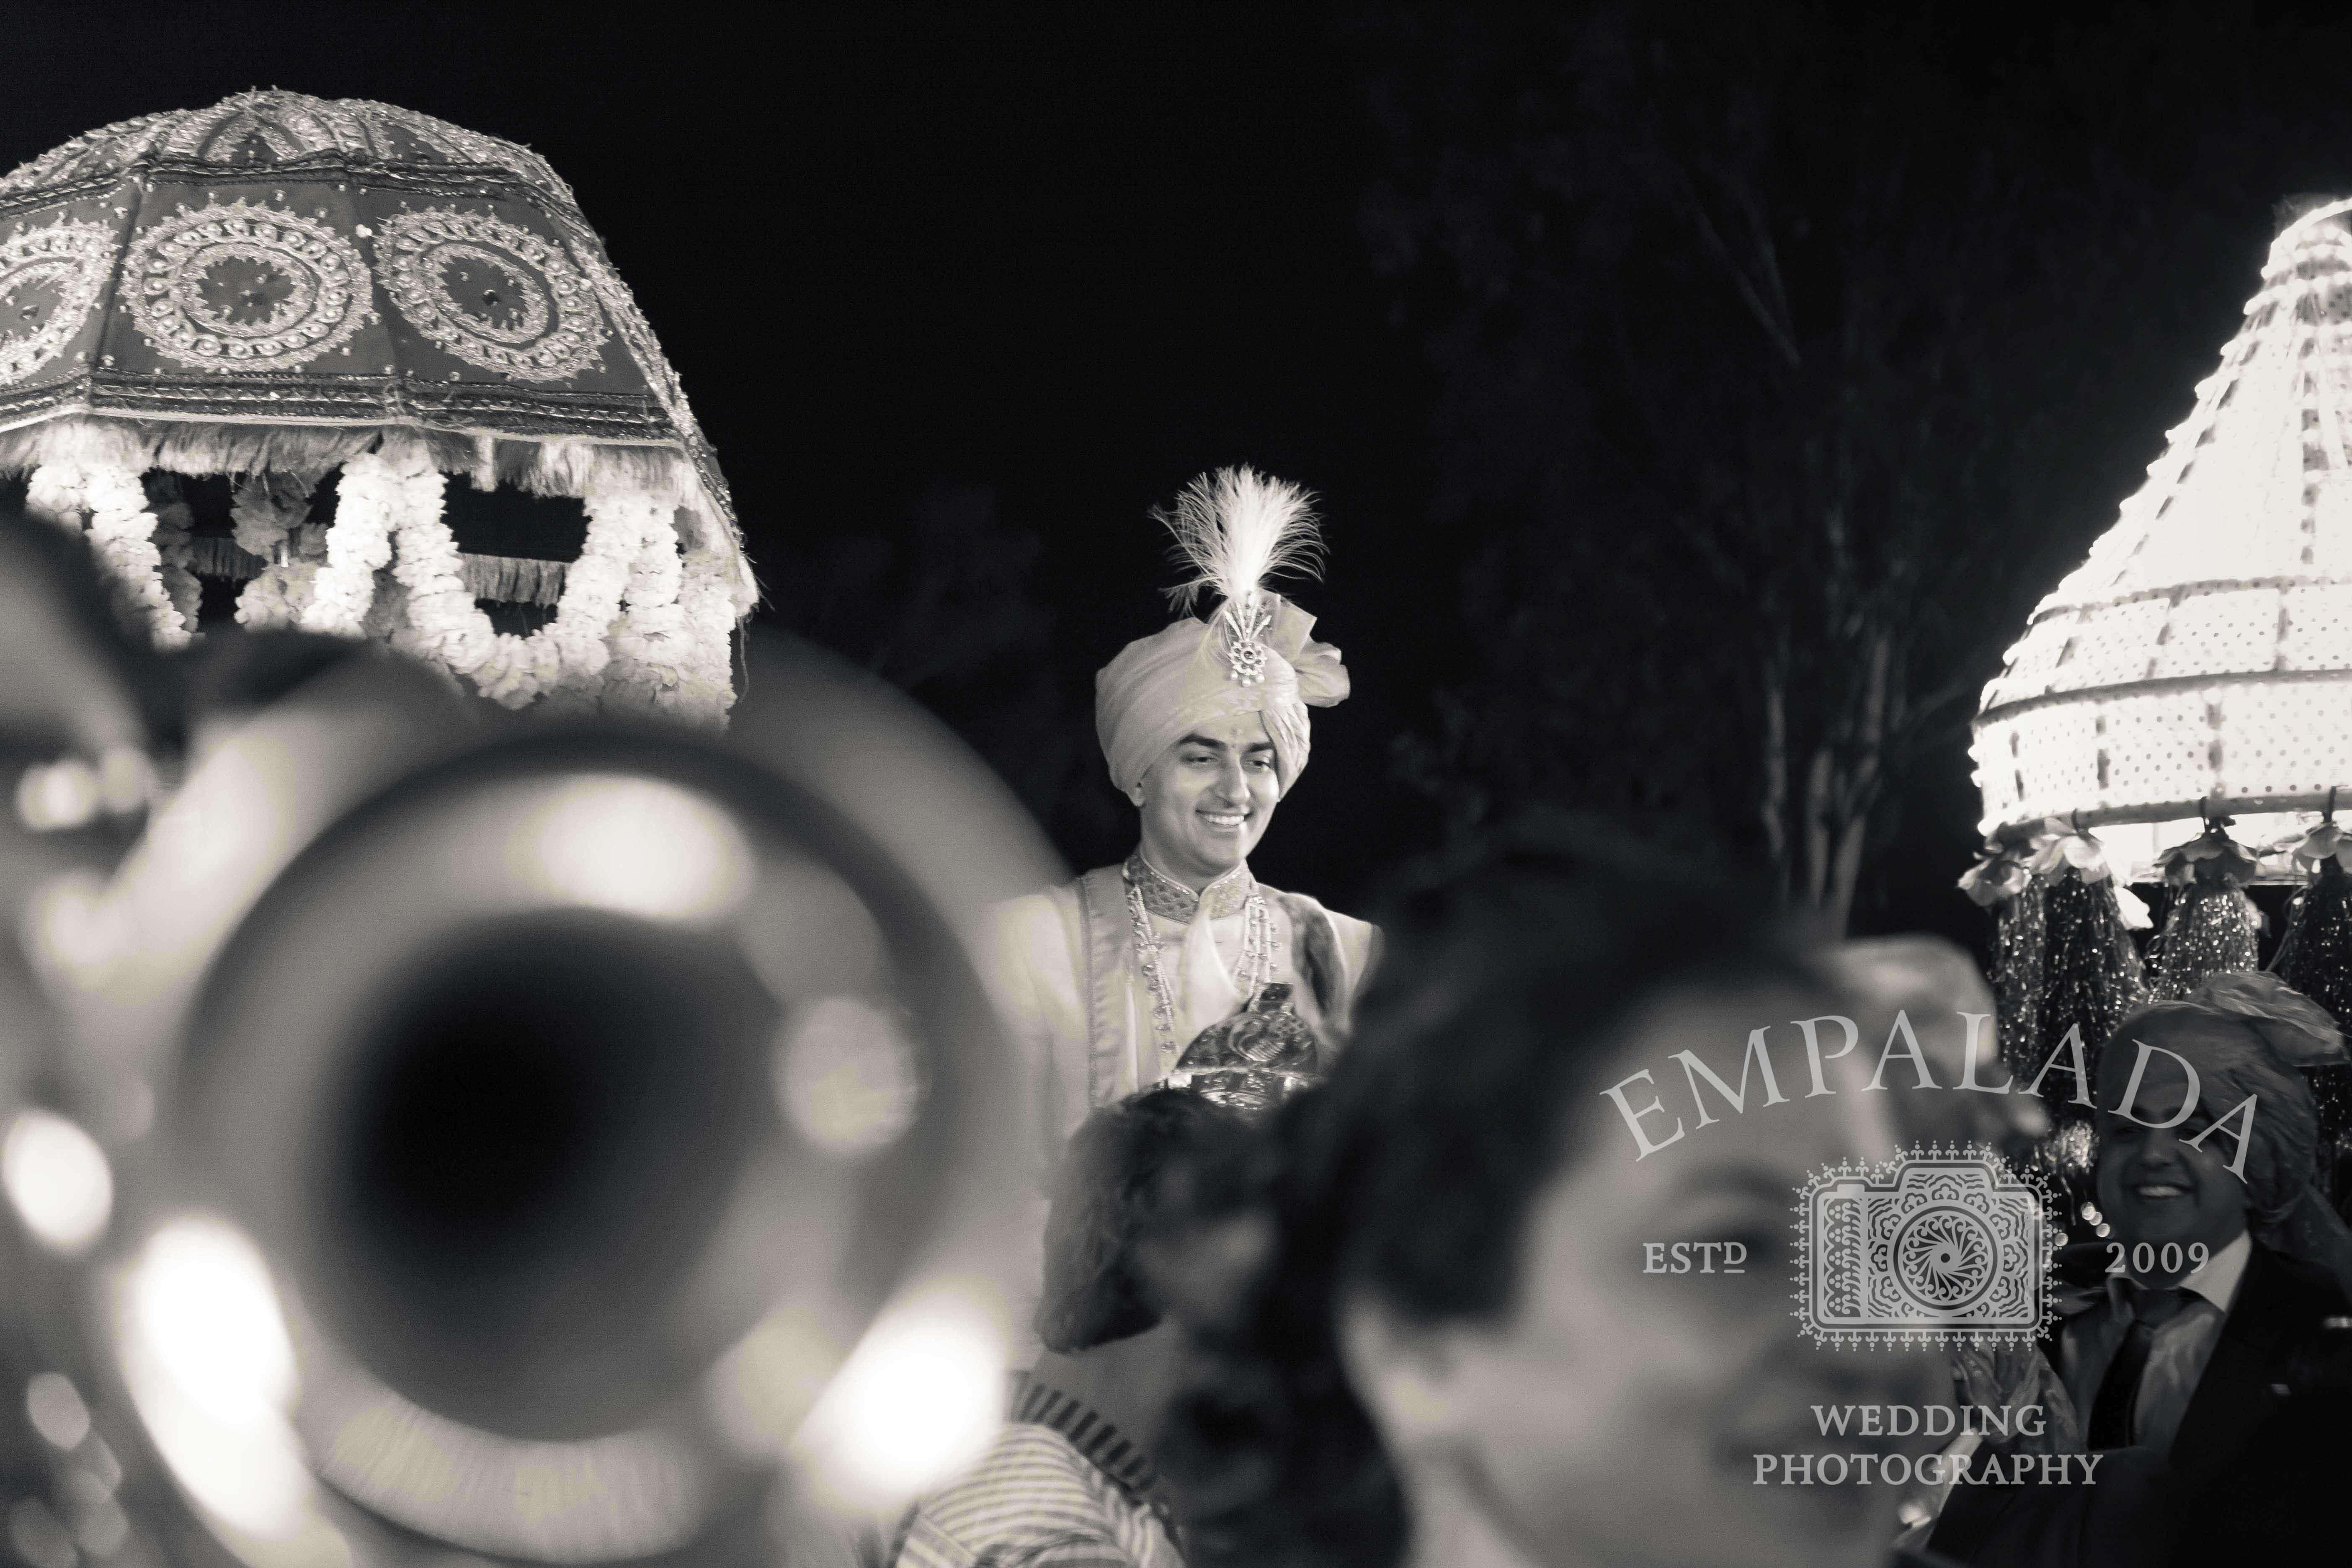 Empalada Weddings